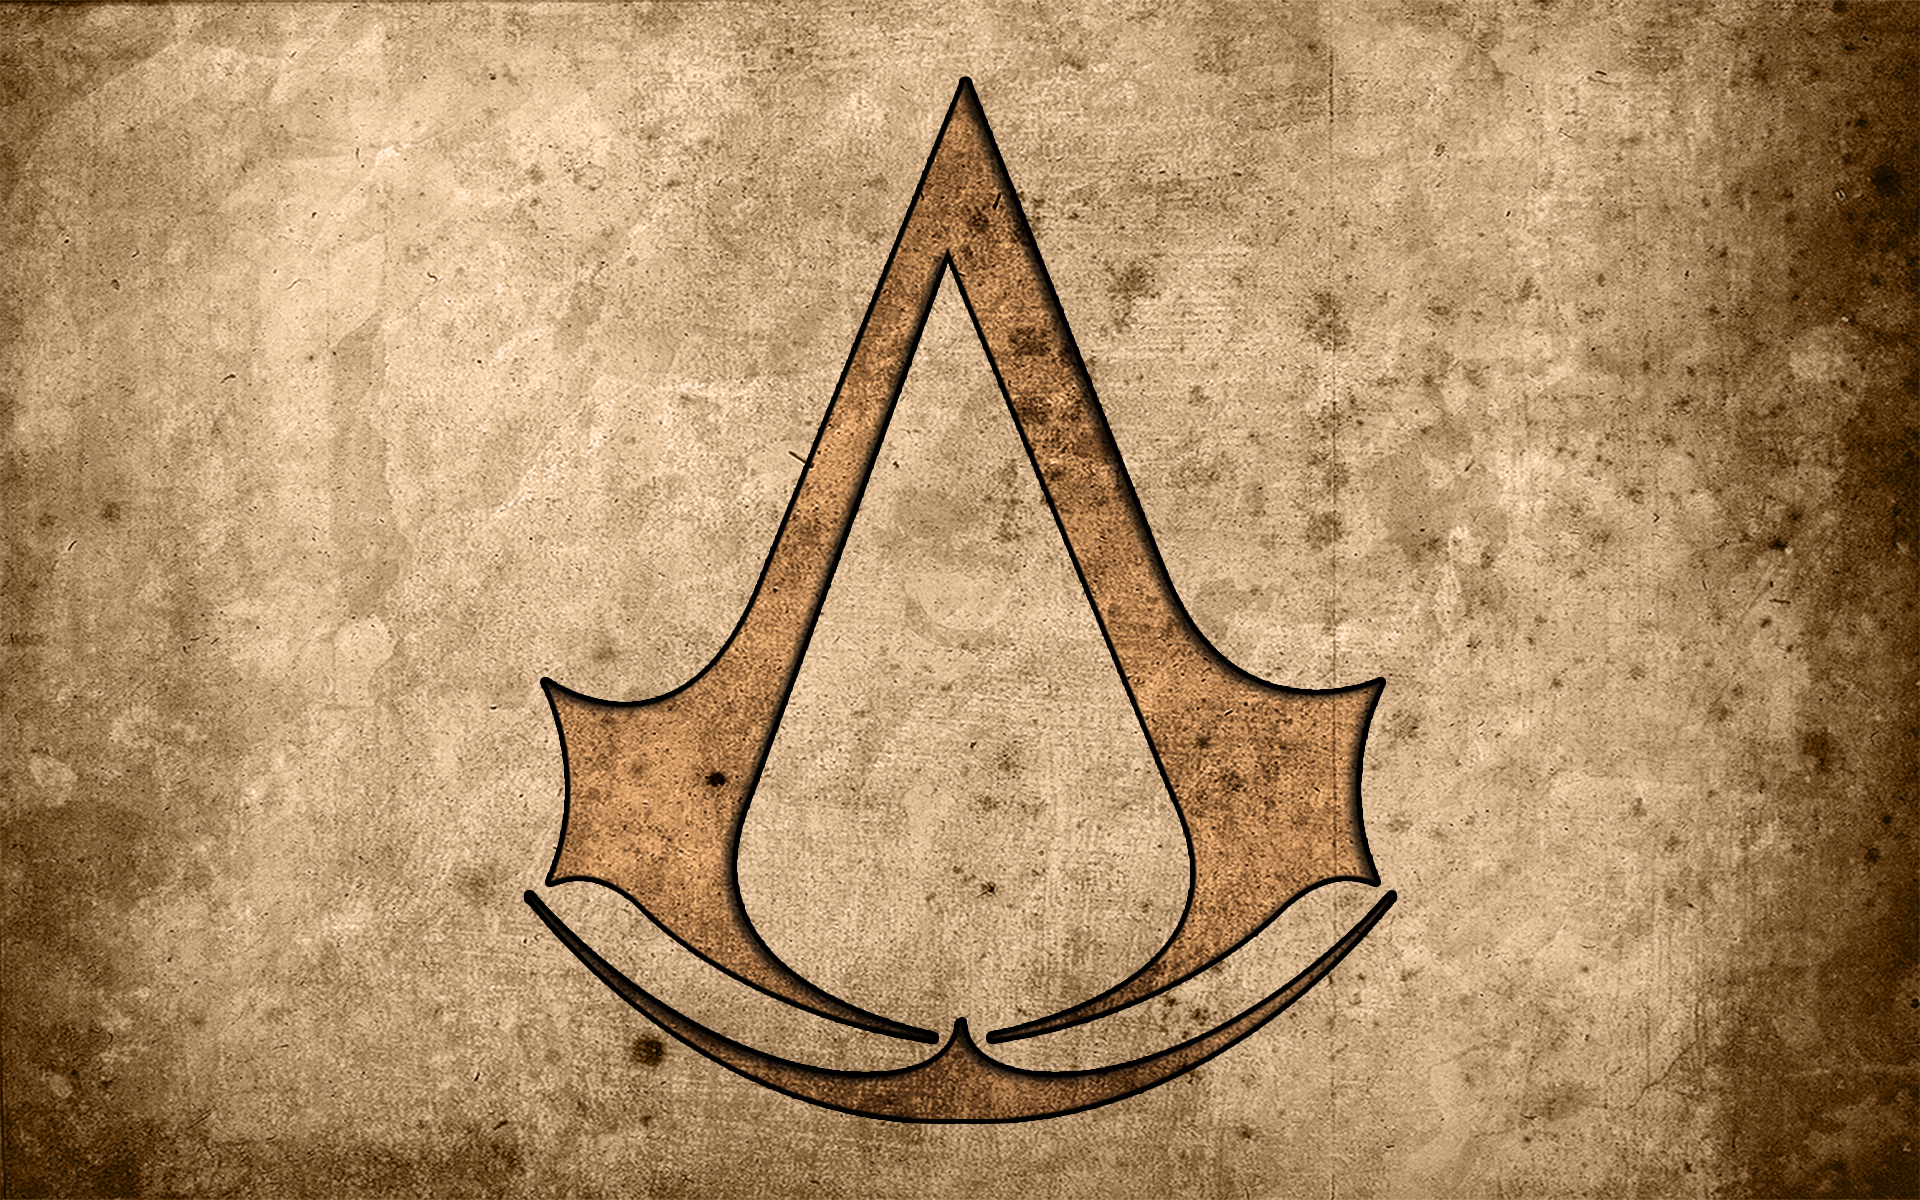 Assassin's Creed Computer Wallpapers, Desktop Backgrounds ...